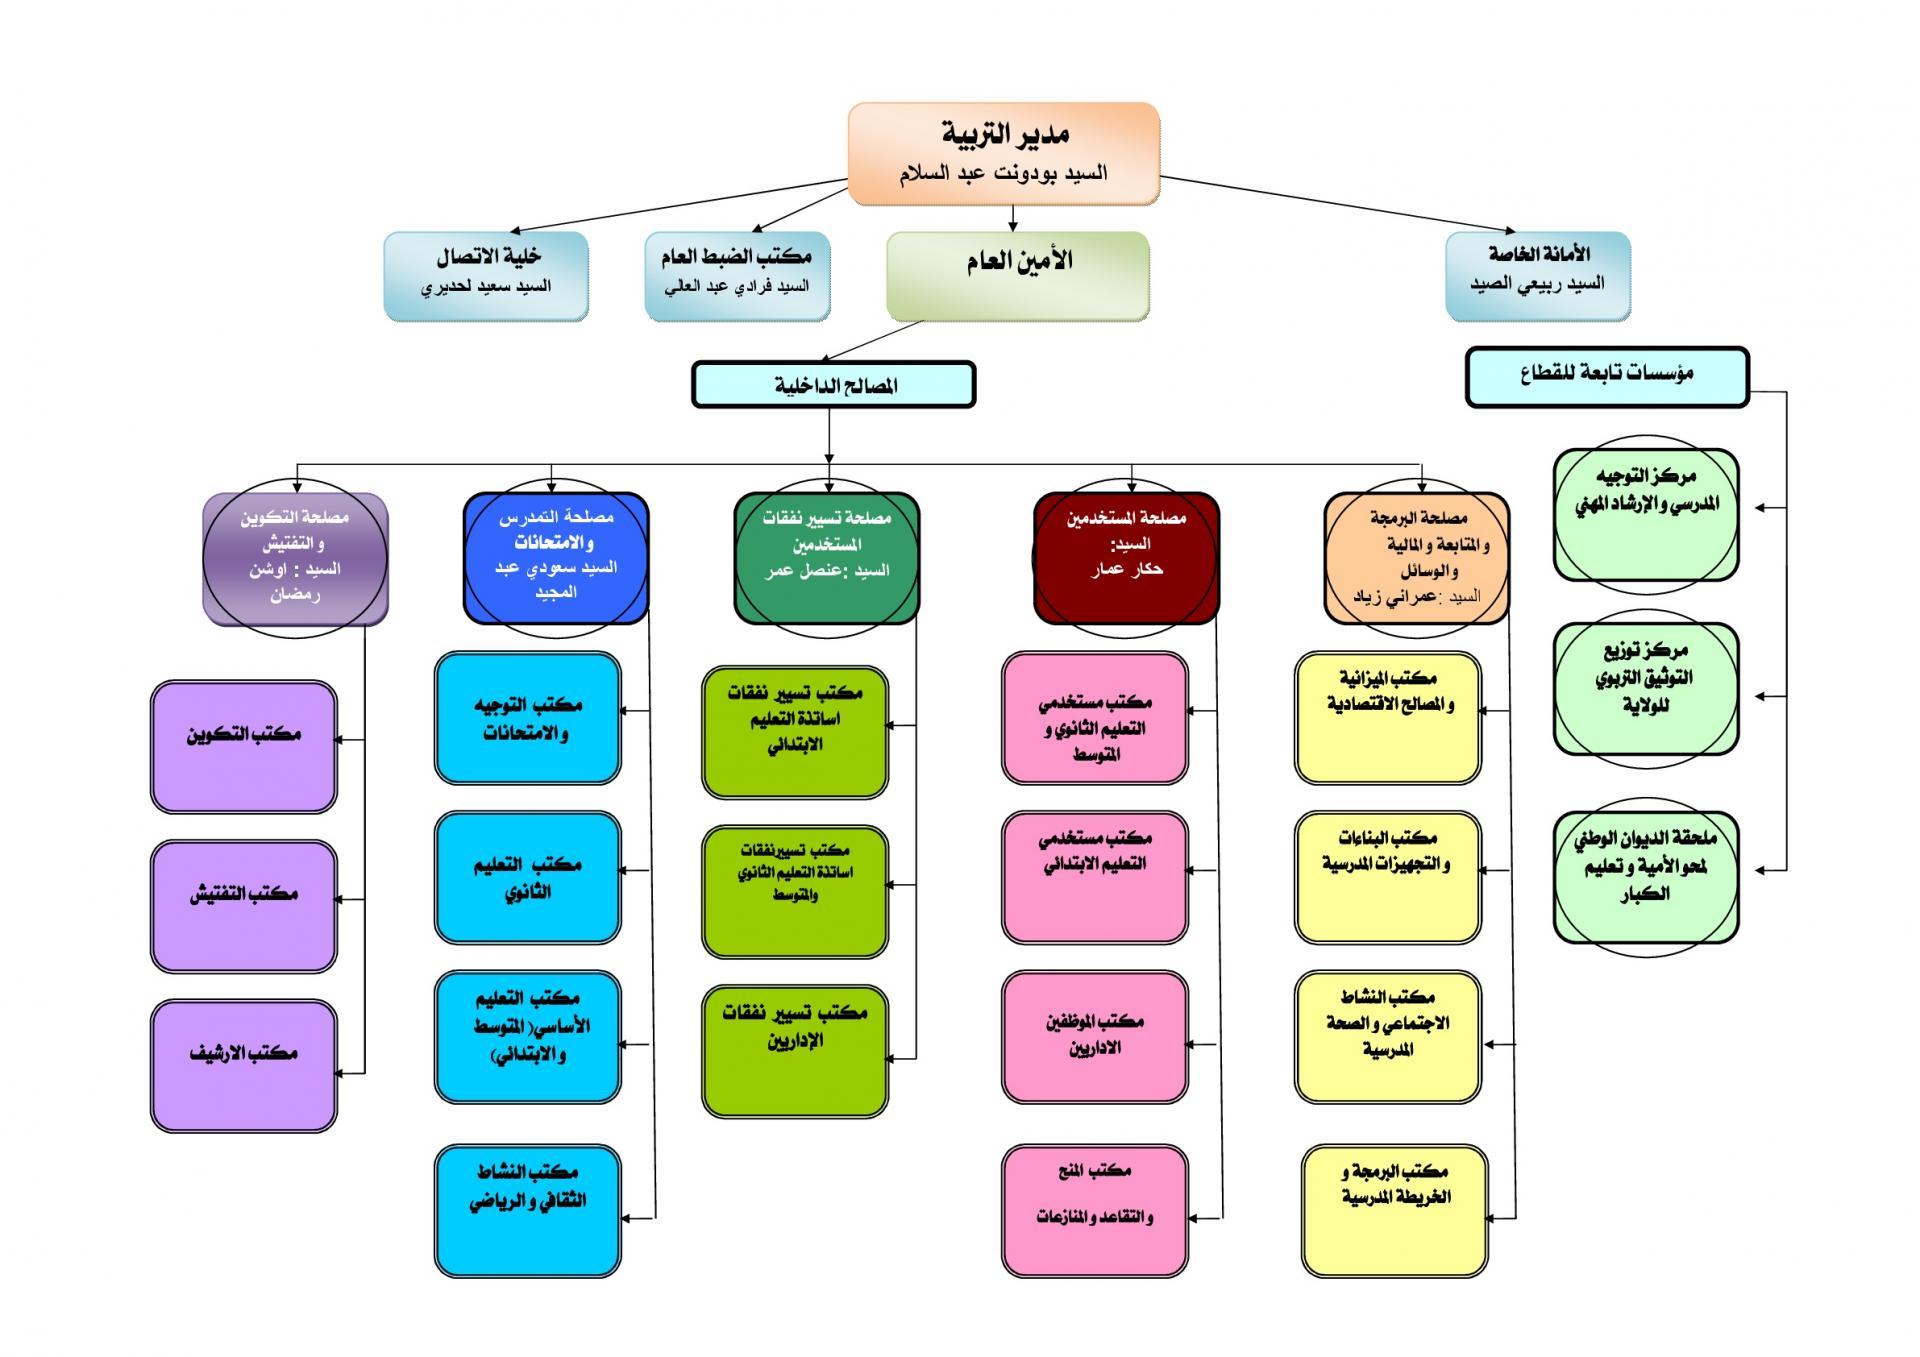 Organigramme de la direction arabe 001 1